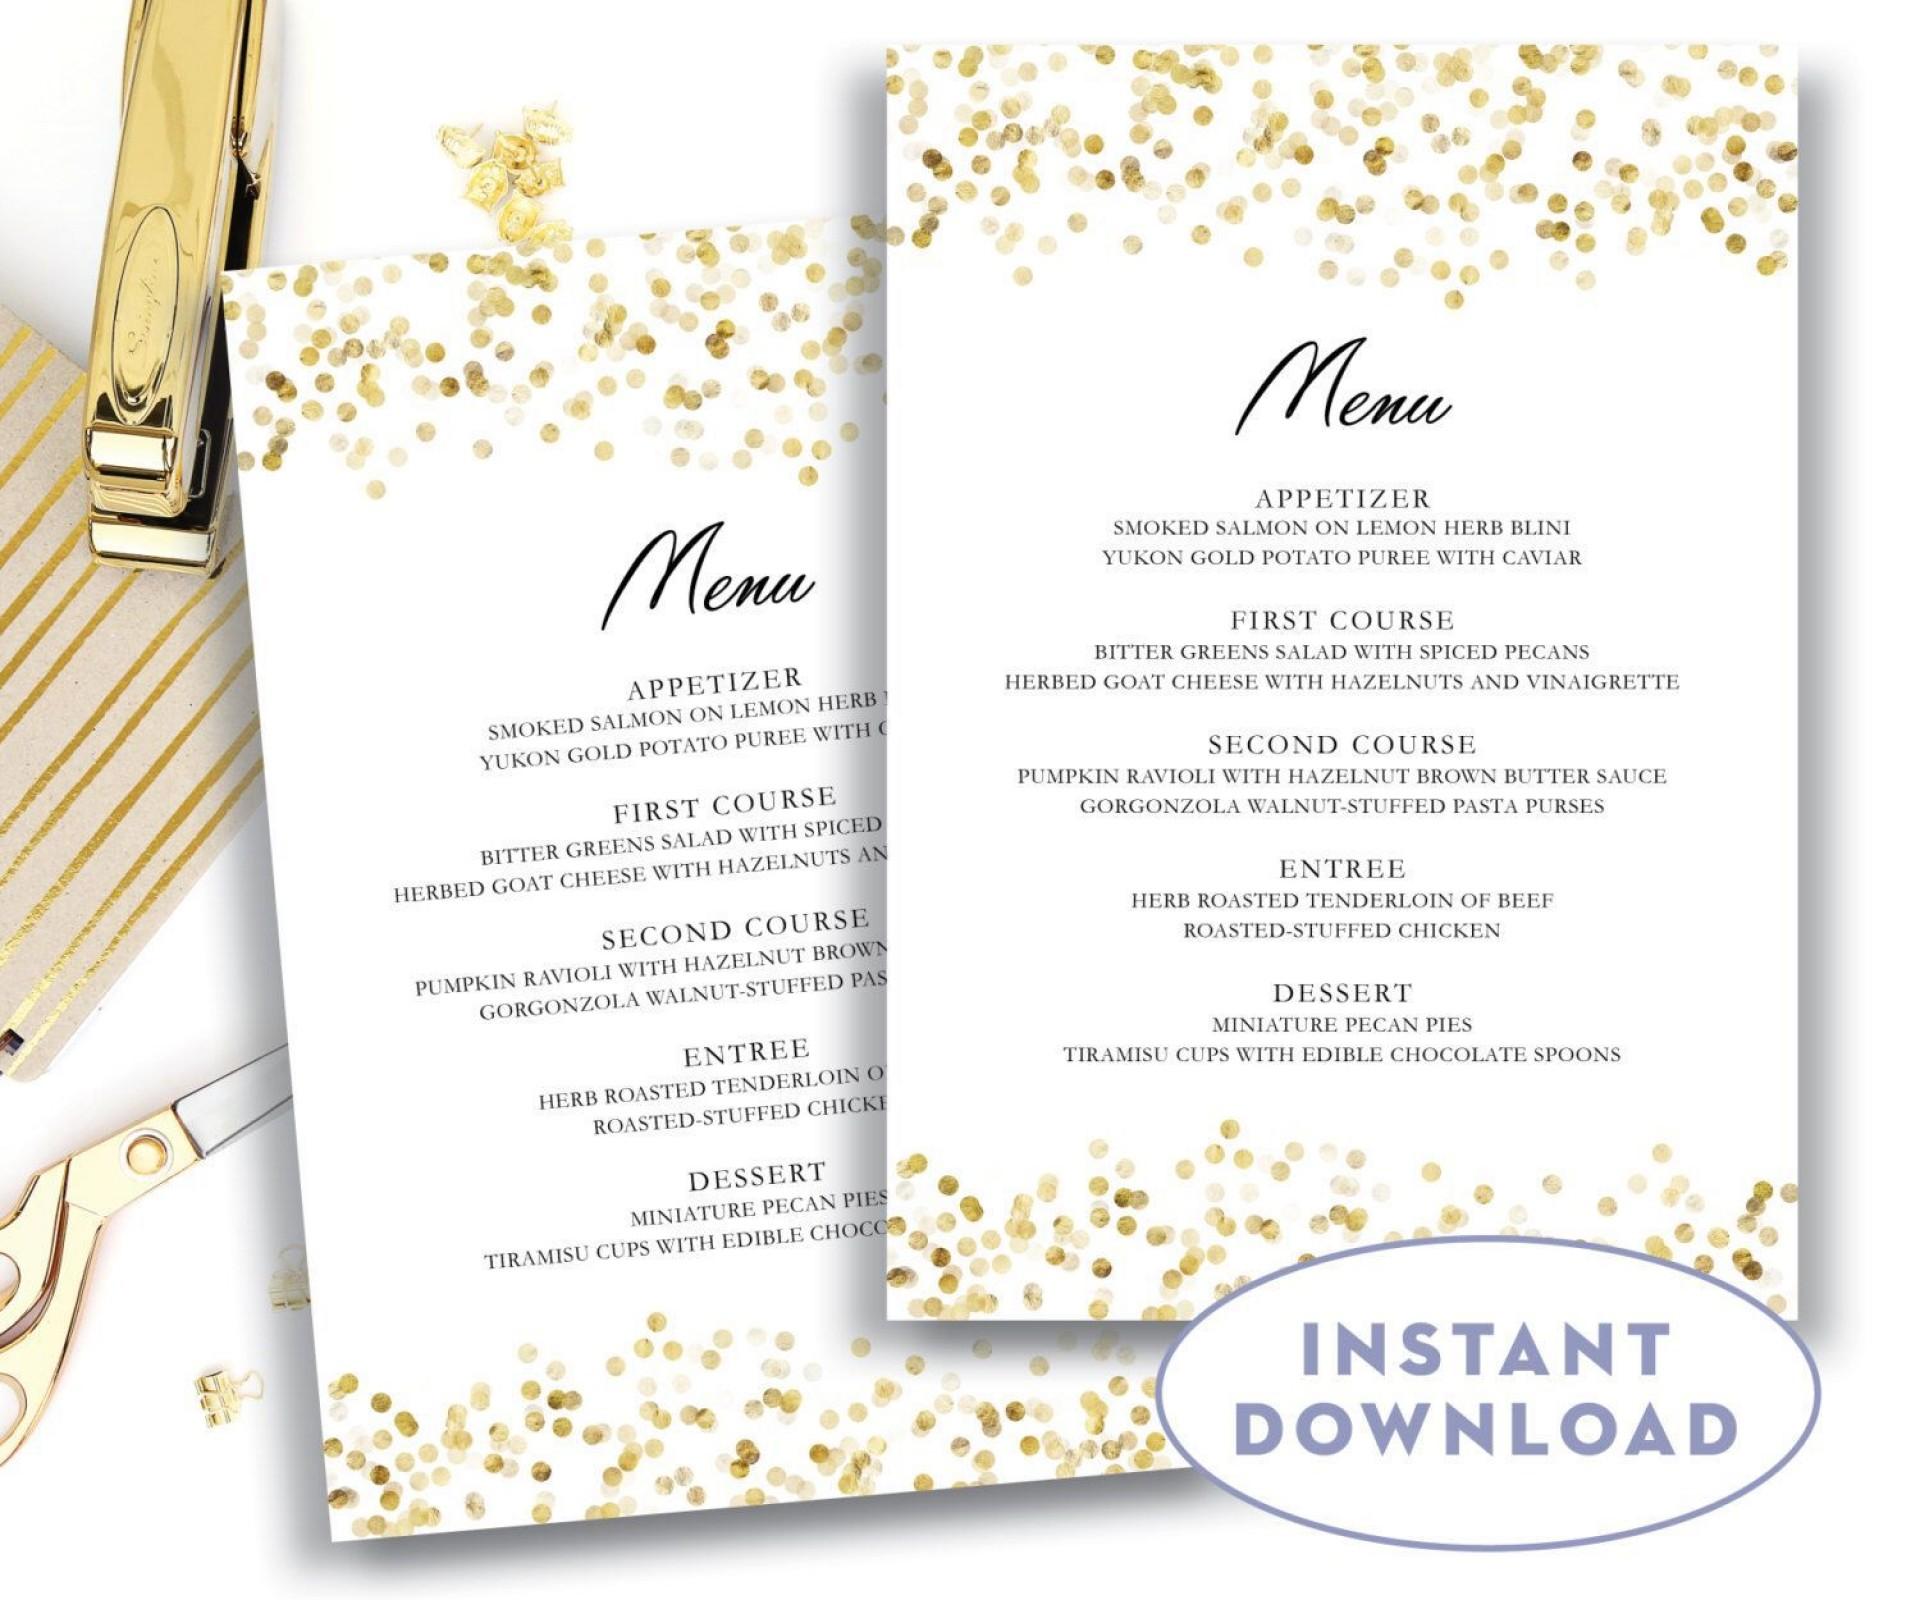 006 Phenomenal Free Wedding Menu Template To Print Highest Quality  Printable Card1920